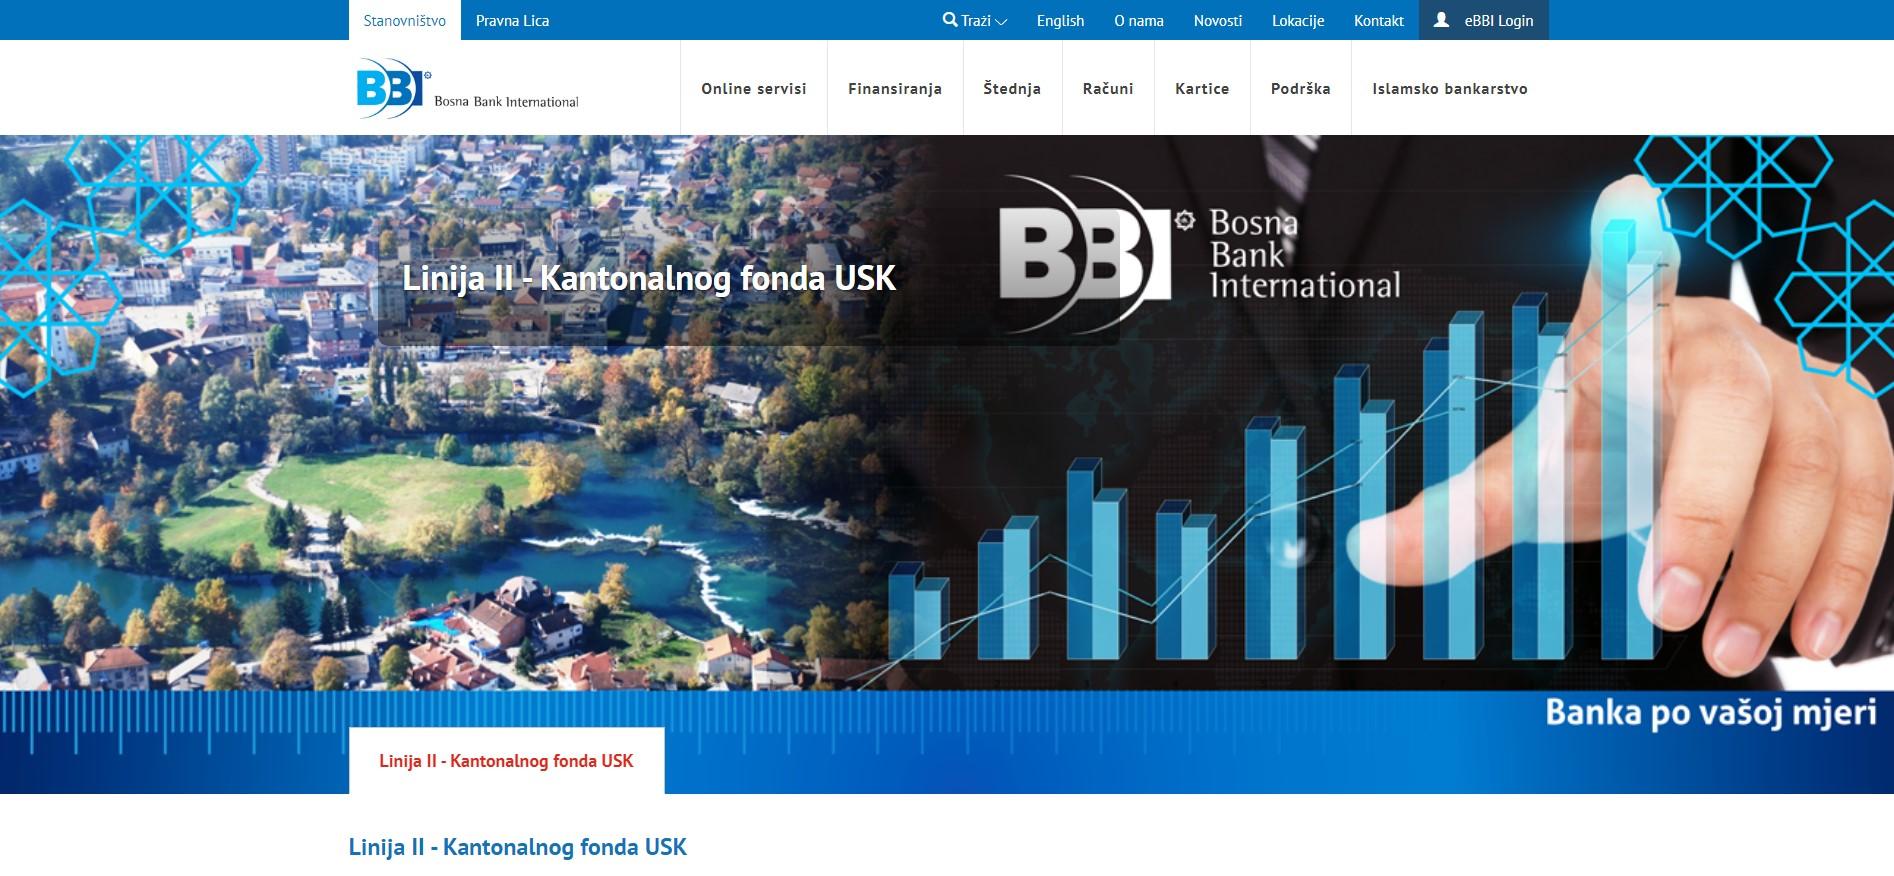 II Linija finansiranja -Bosna Bank International